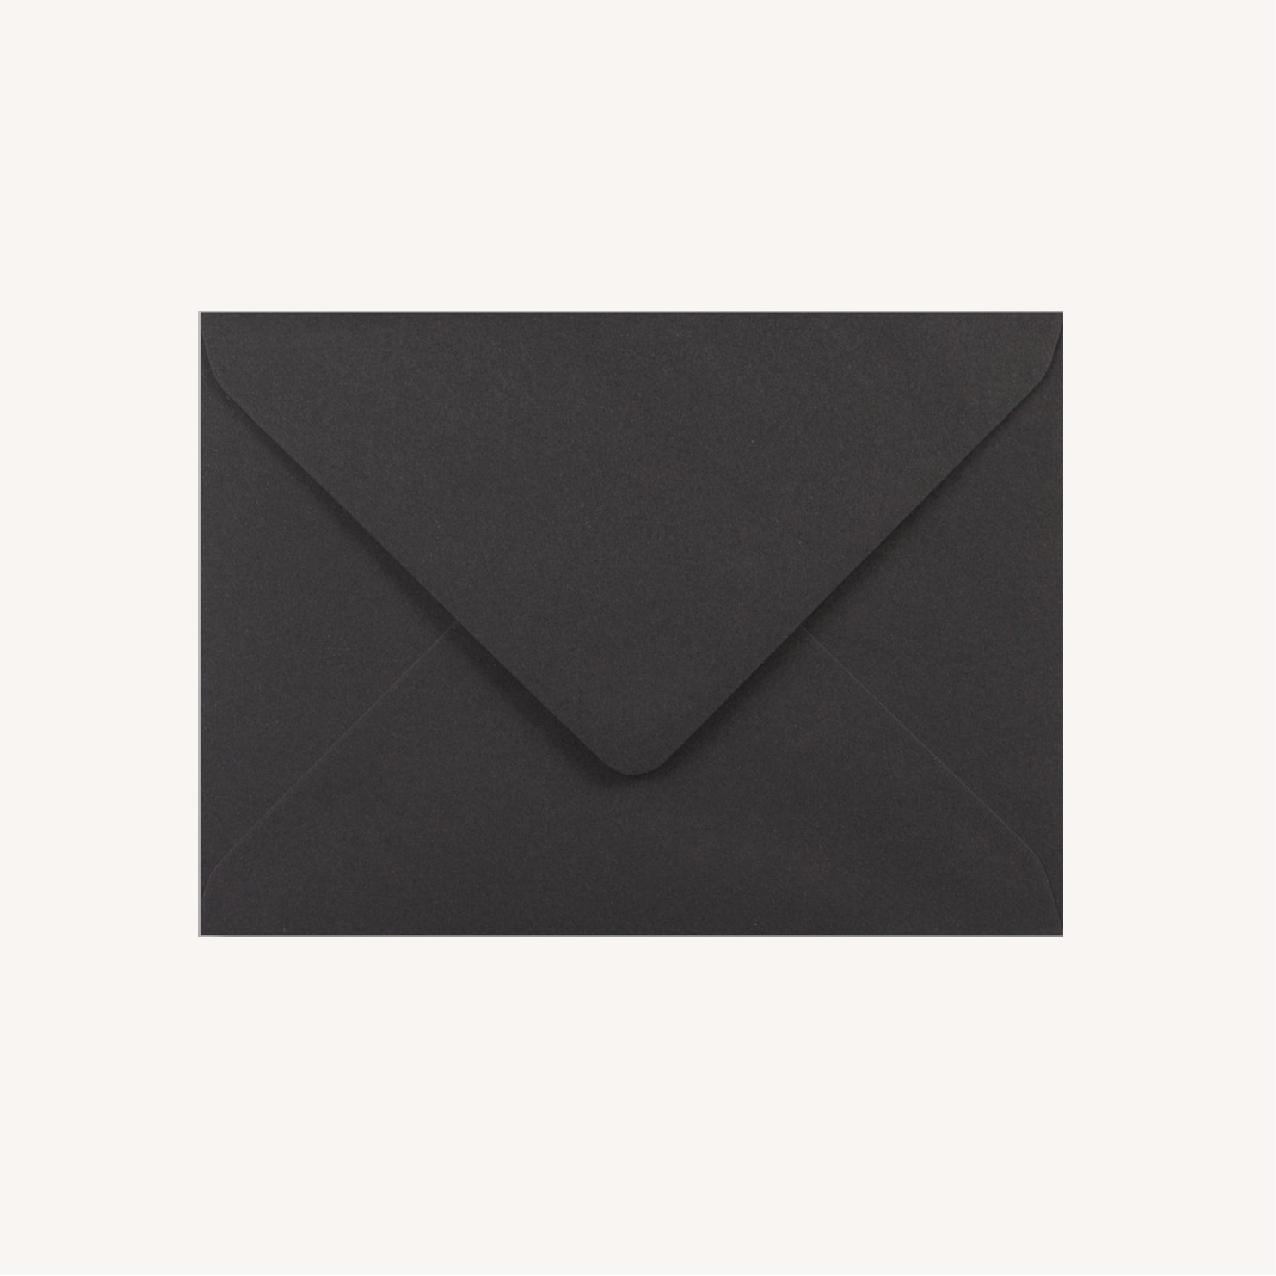 Enveloppe noire black and white noir et blanc moderne lettering innovant graphique